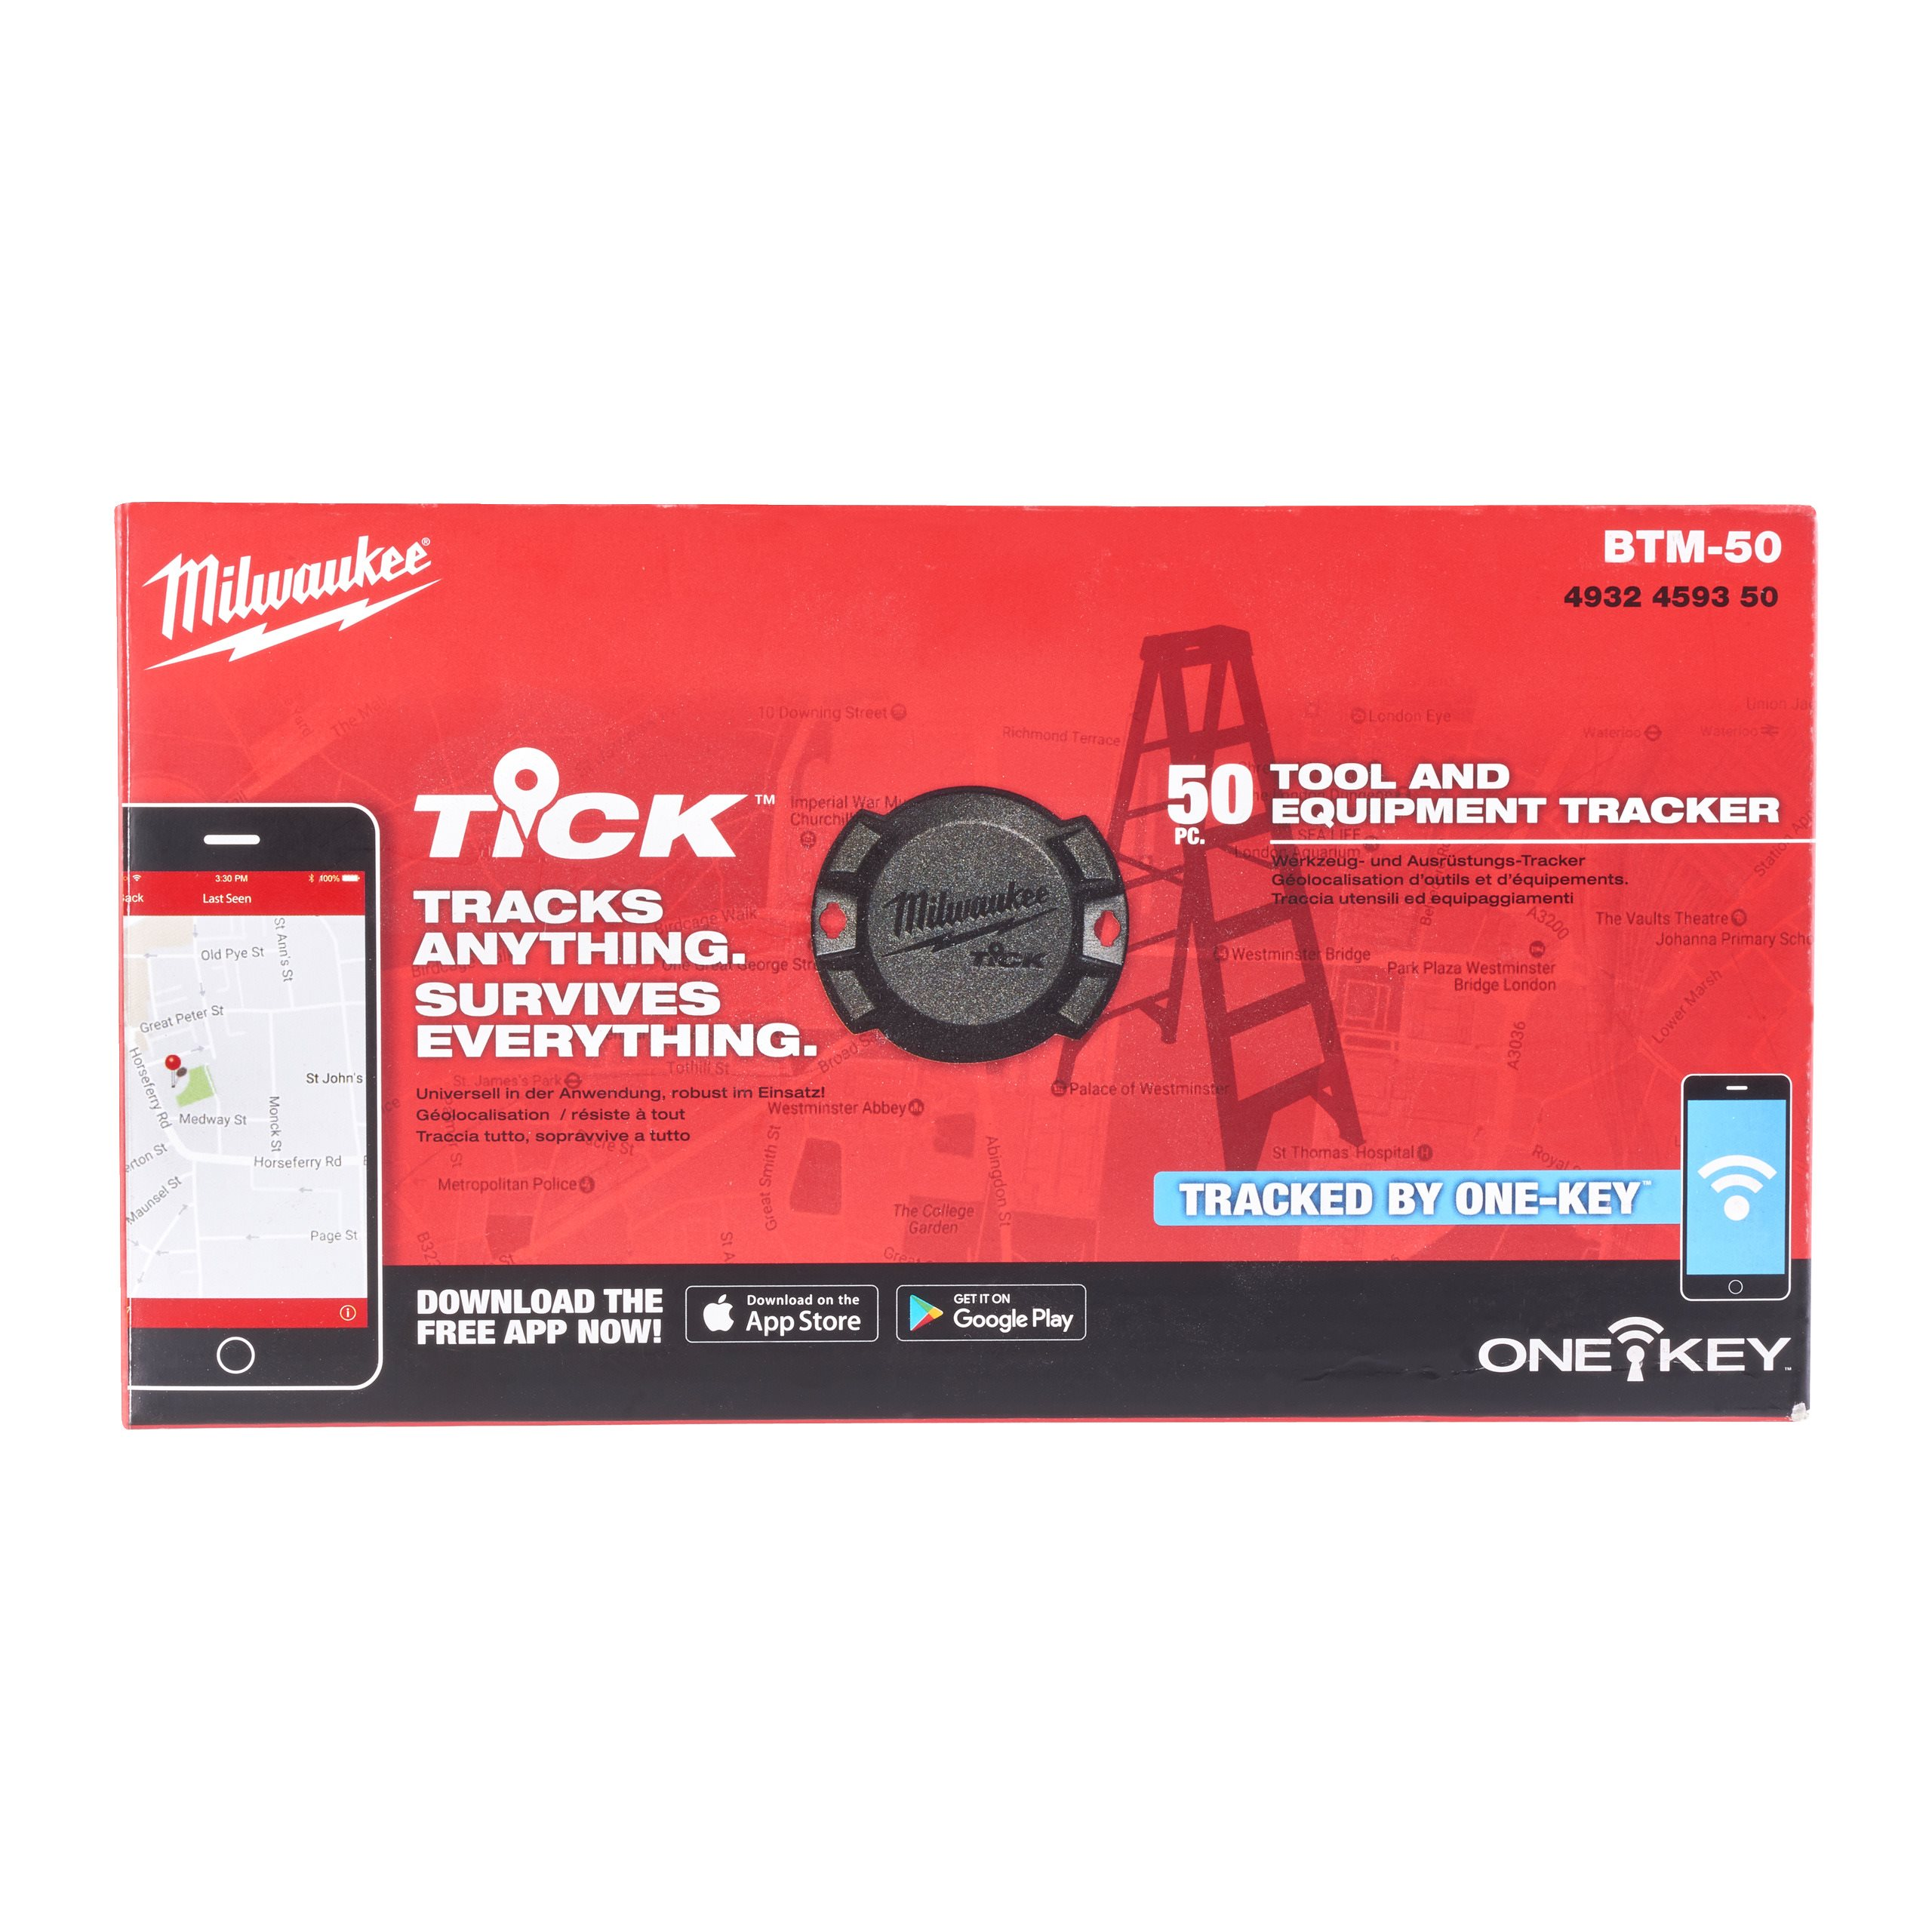 One Key 1 Tracker Brand New Milwaukee BTM-1 TICK Tool and Equipment Tracker